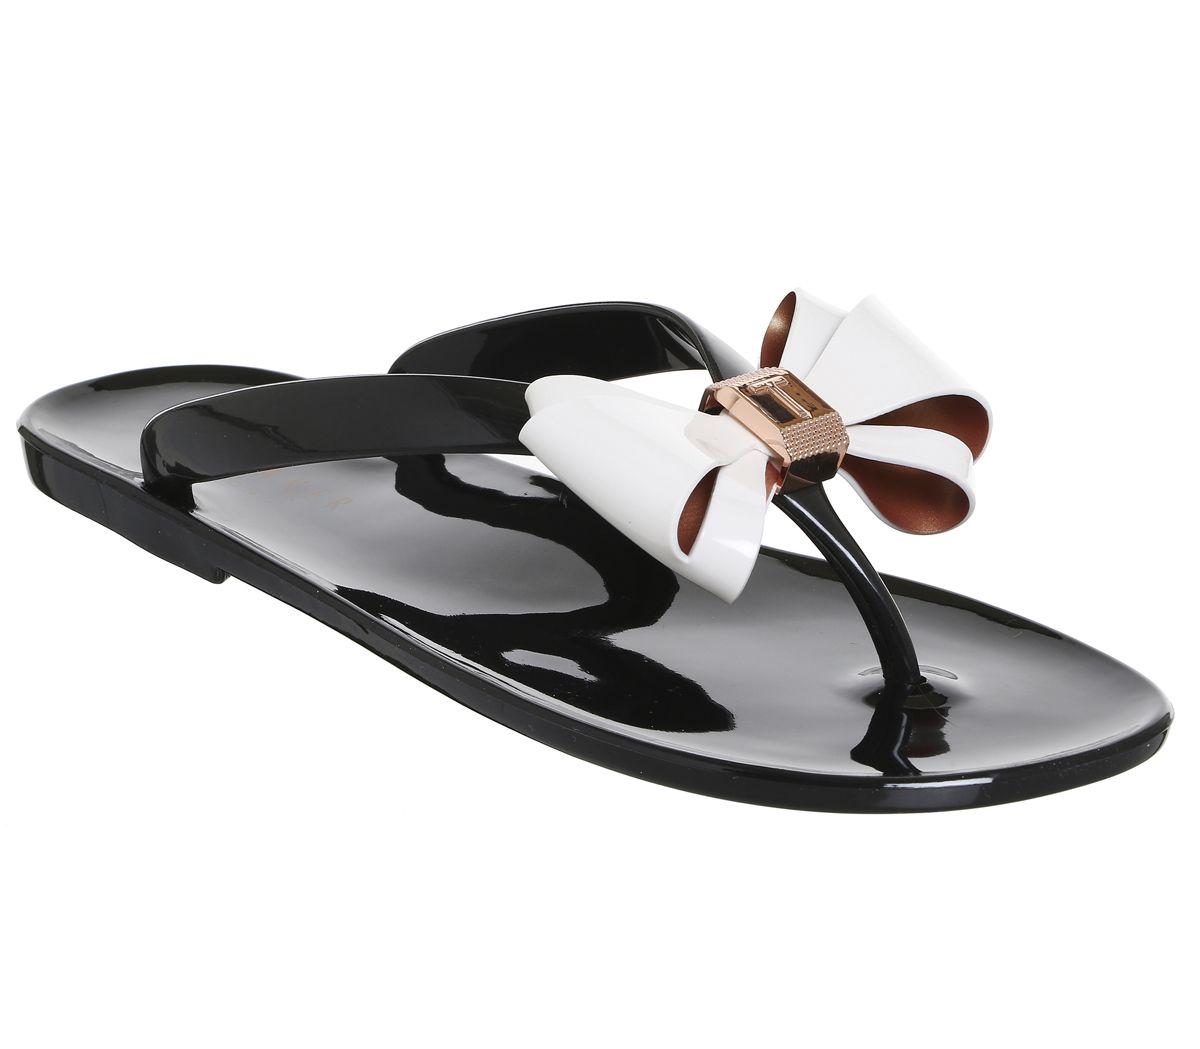 e0c6235a9 Ted Baker Rafeek Flip Flop Black Cream - Sandals